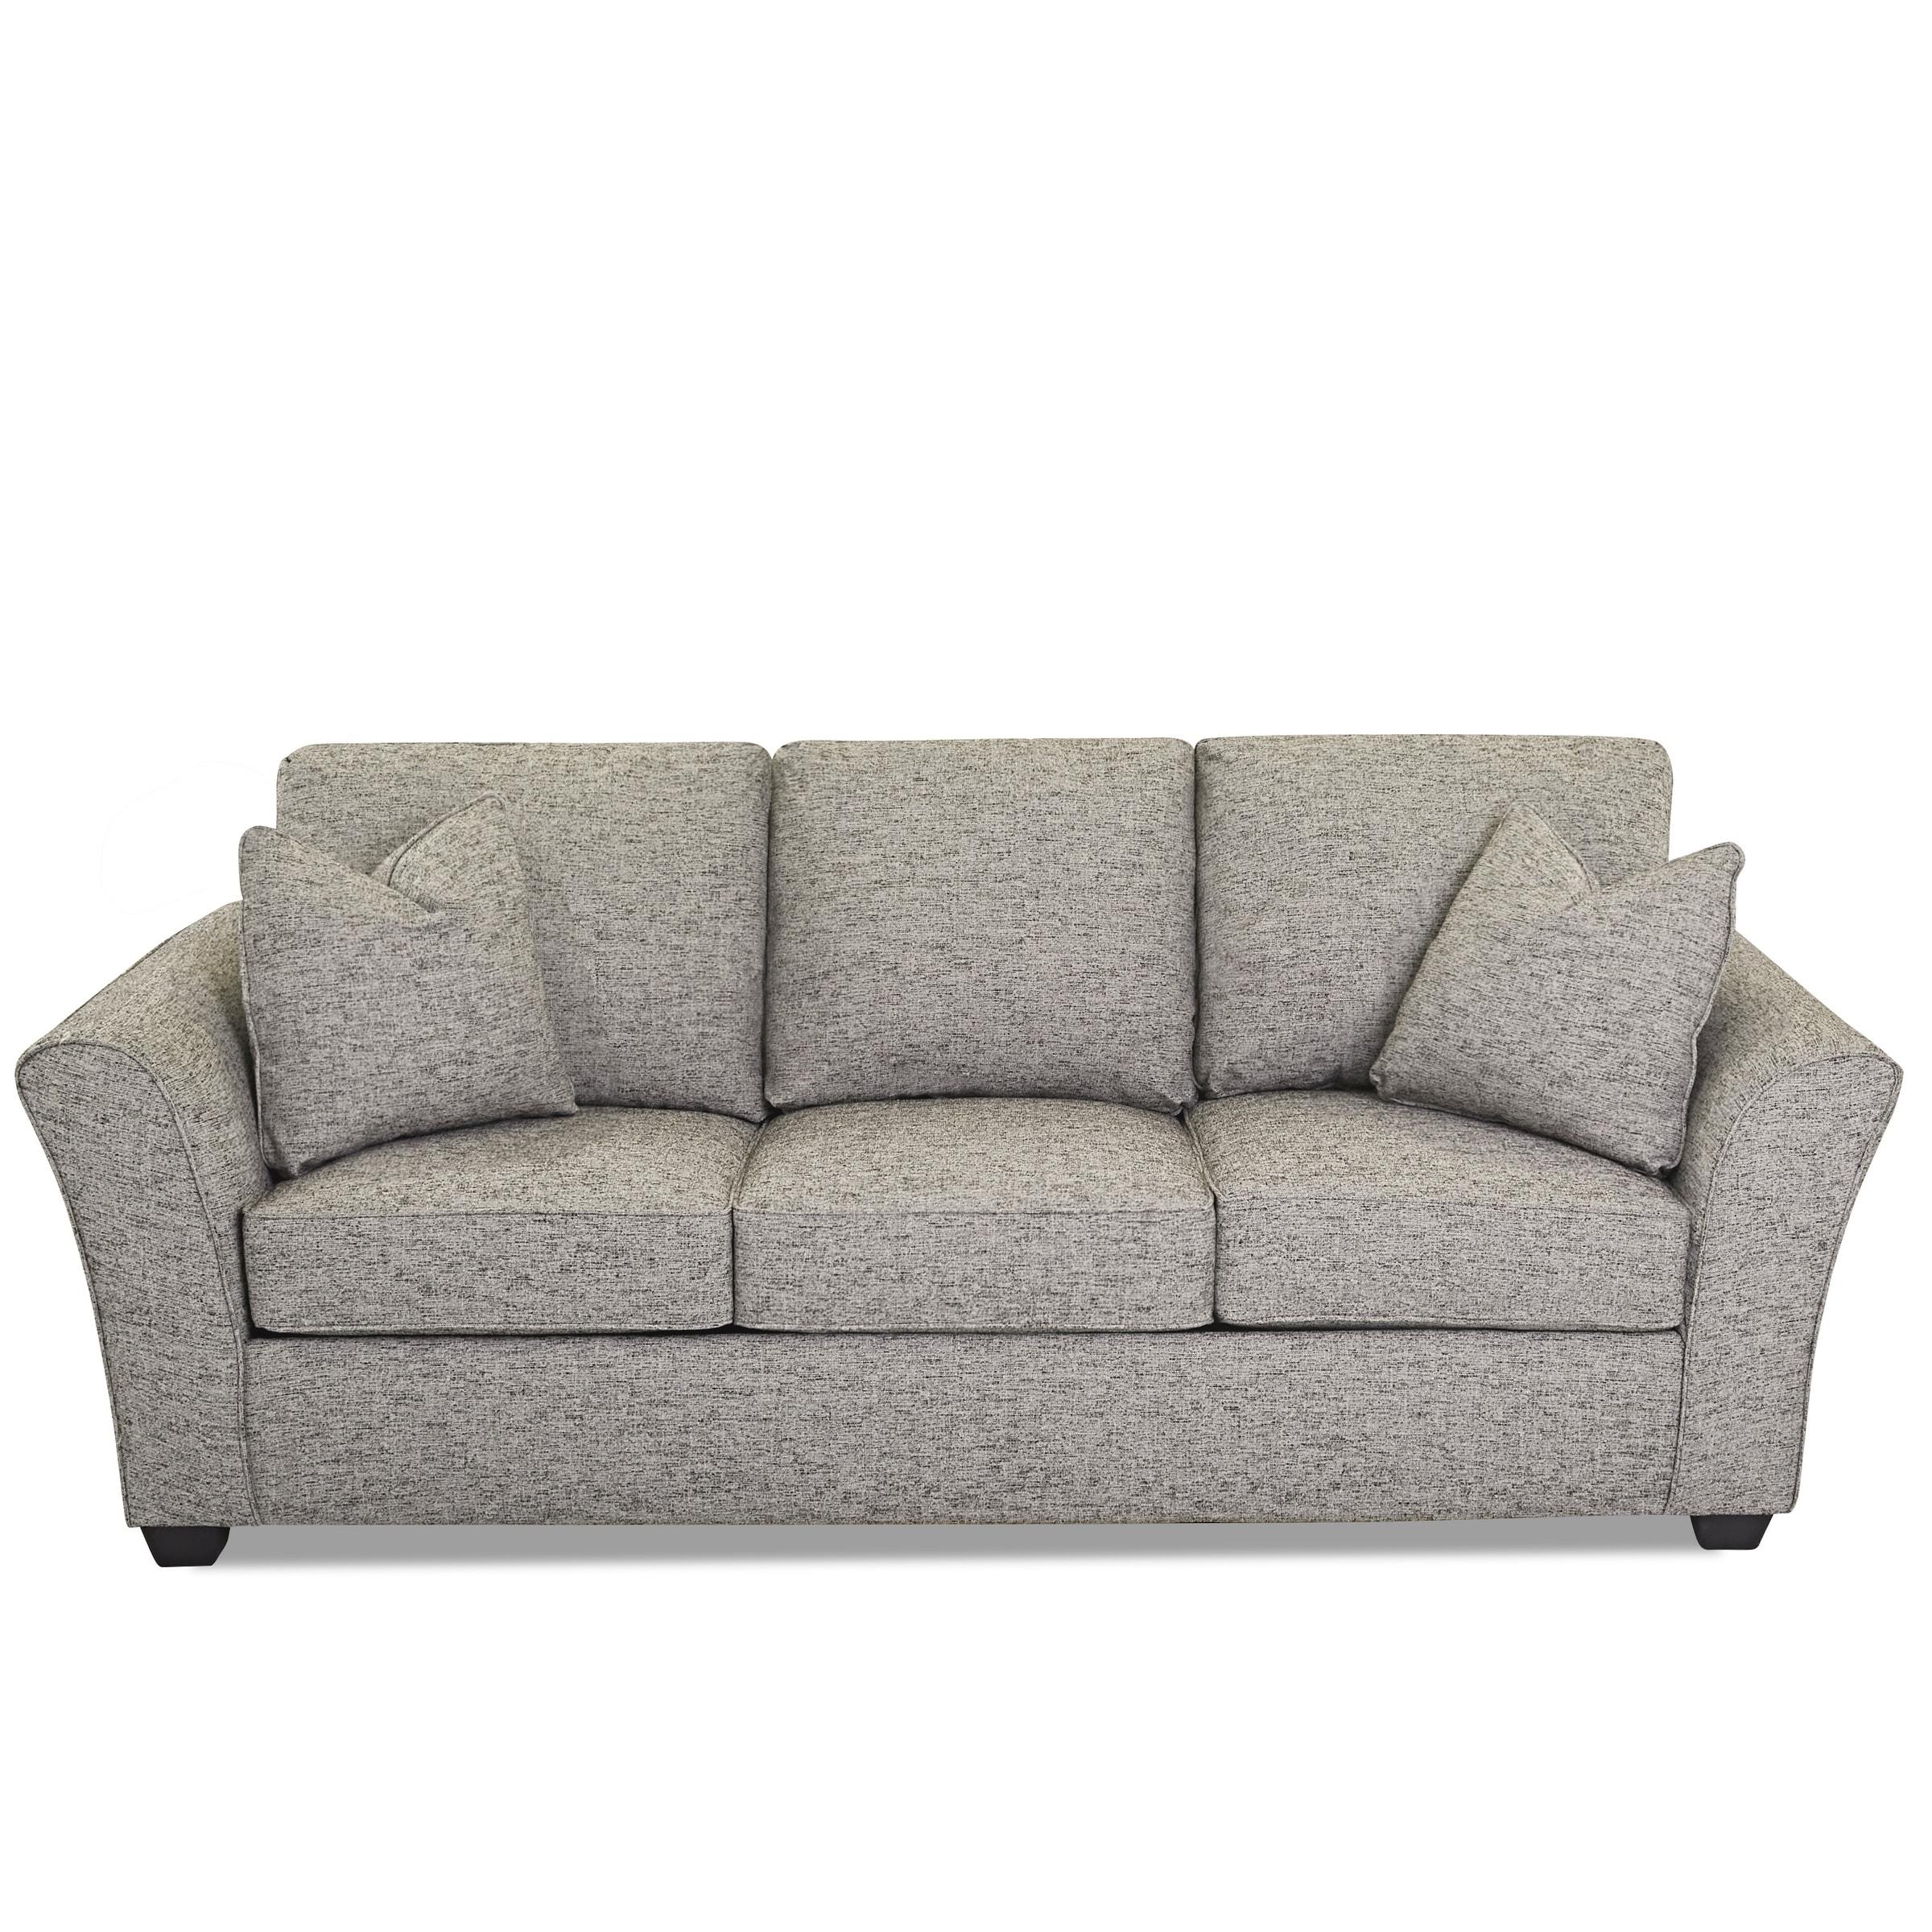 - Shop Stella Sleeper Sofa, Queen-size - On Sale - Overstock - 29158911